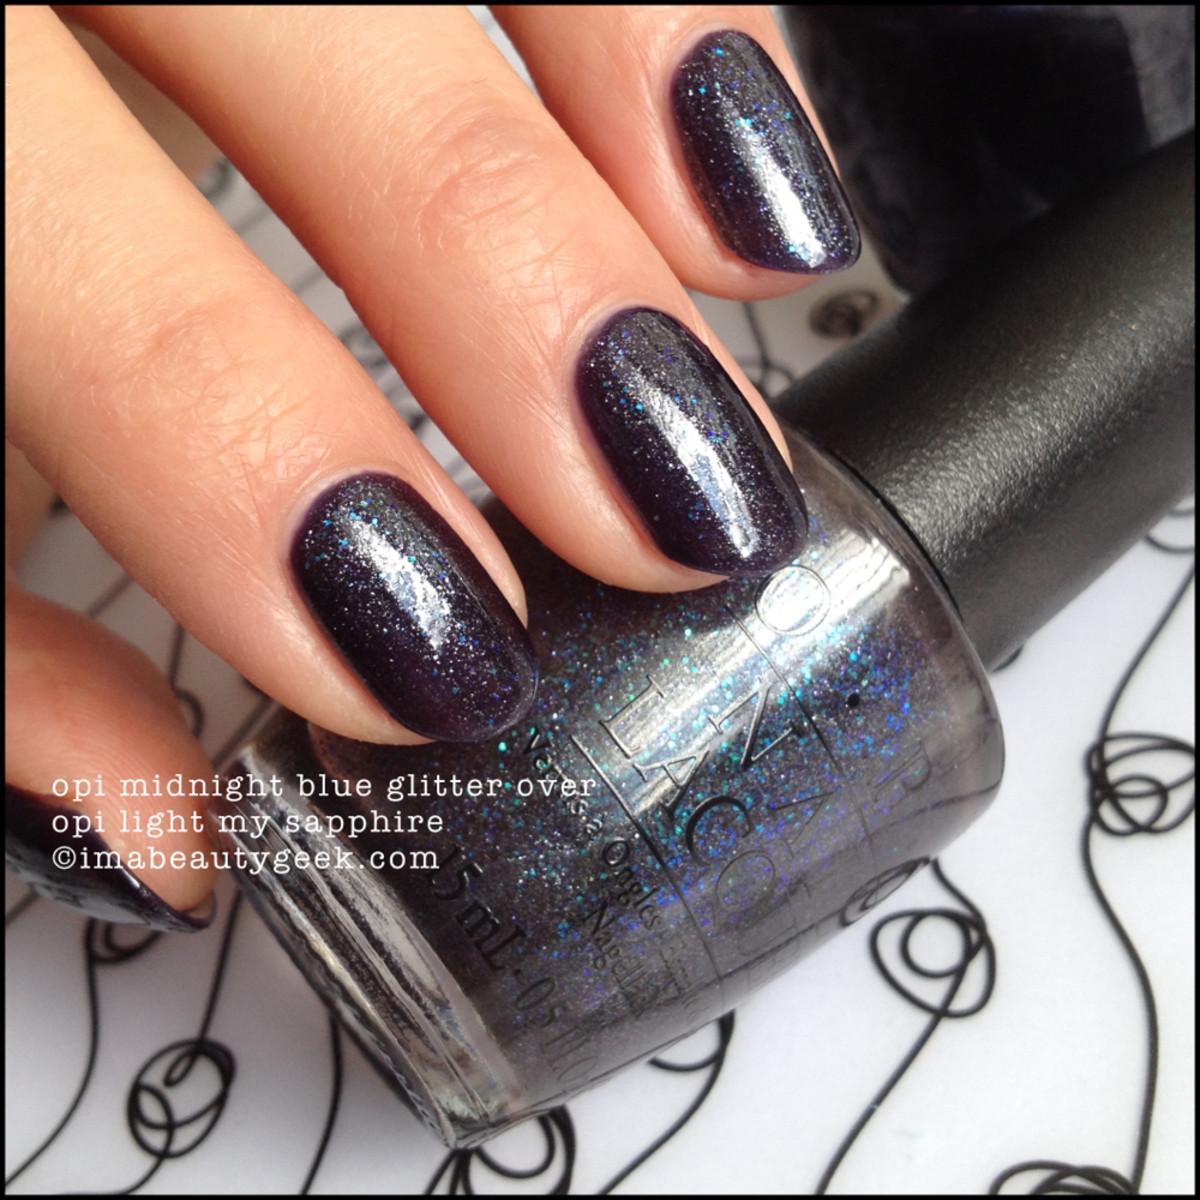 OPI Midnight Blue Glitter over OPI Light My Sapphire Beautygeeks